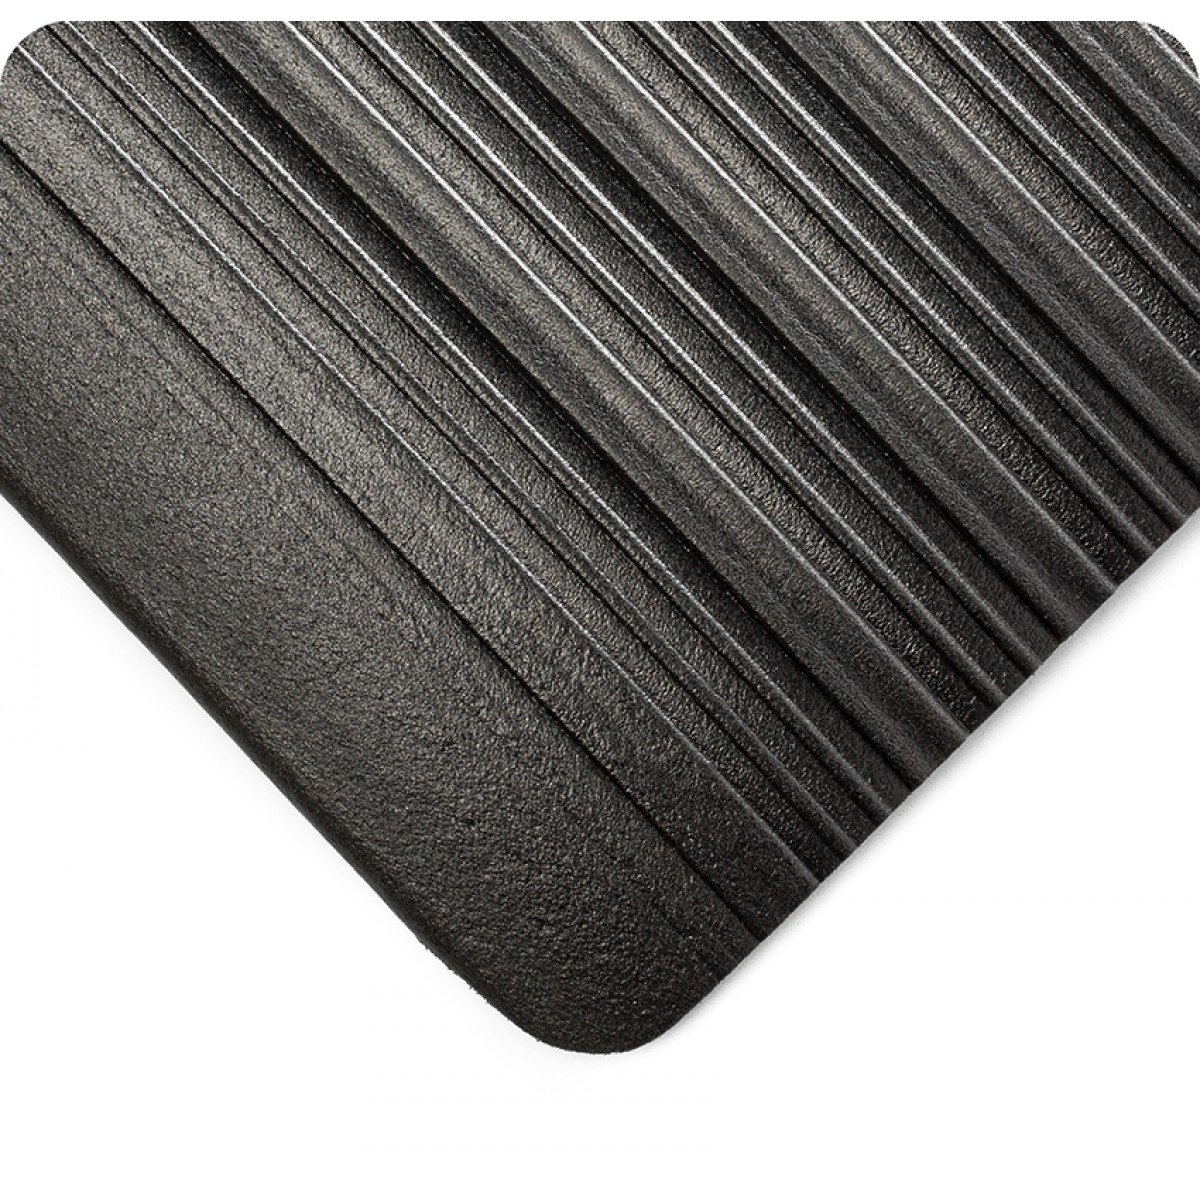 Wearwell 451.38x3x14BK Tuf Sponge Mat, 14' Length x 3' Width x 3/8'' Thick, Black